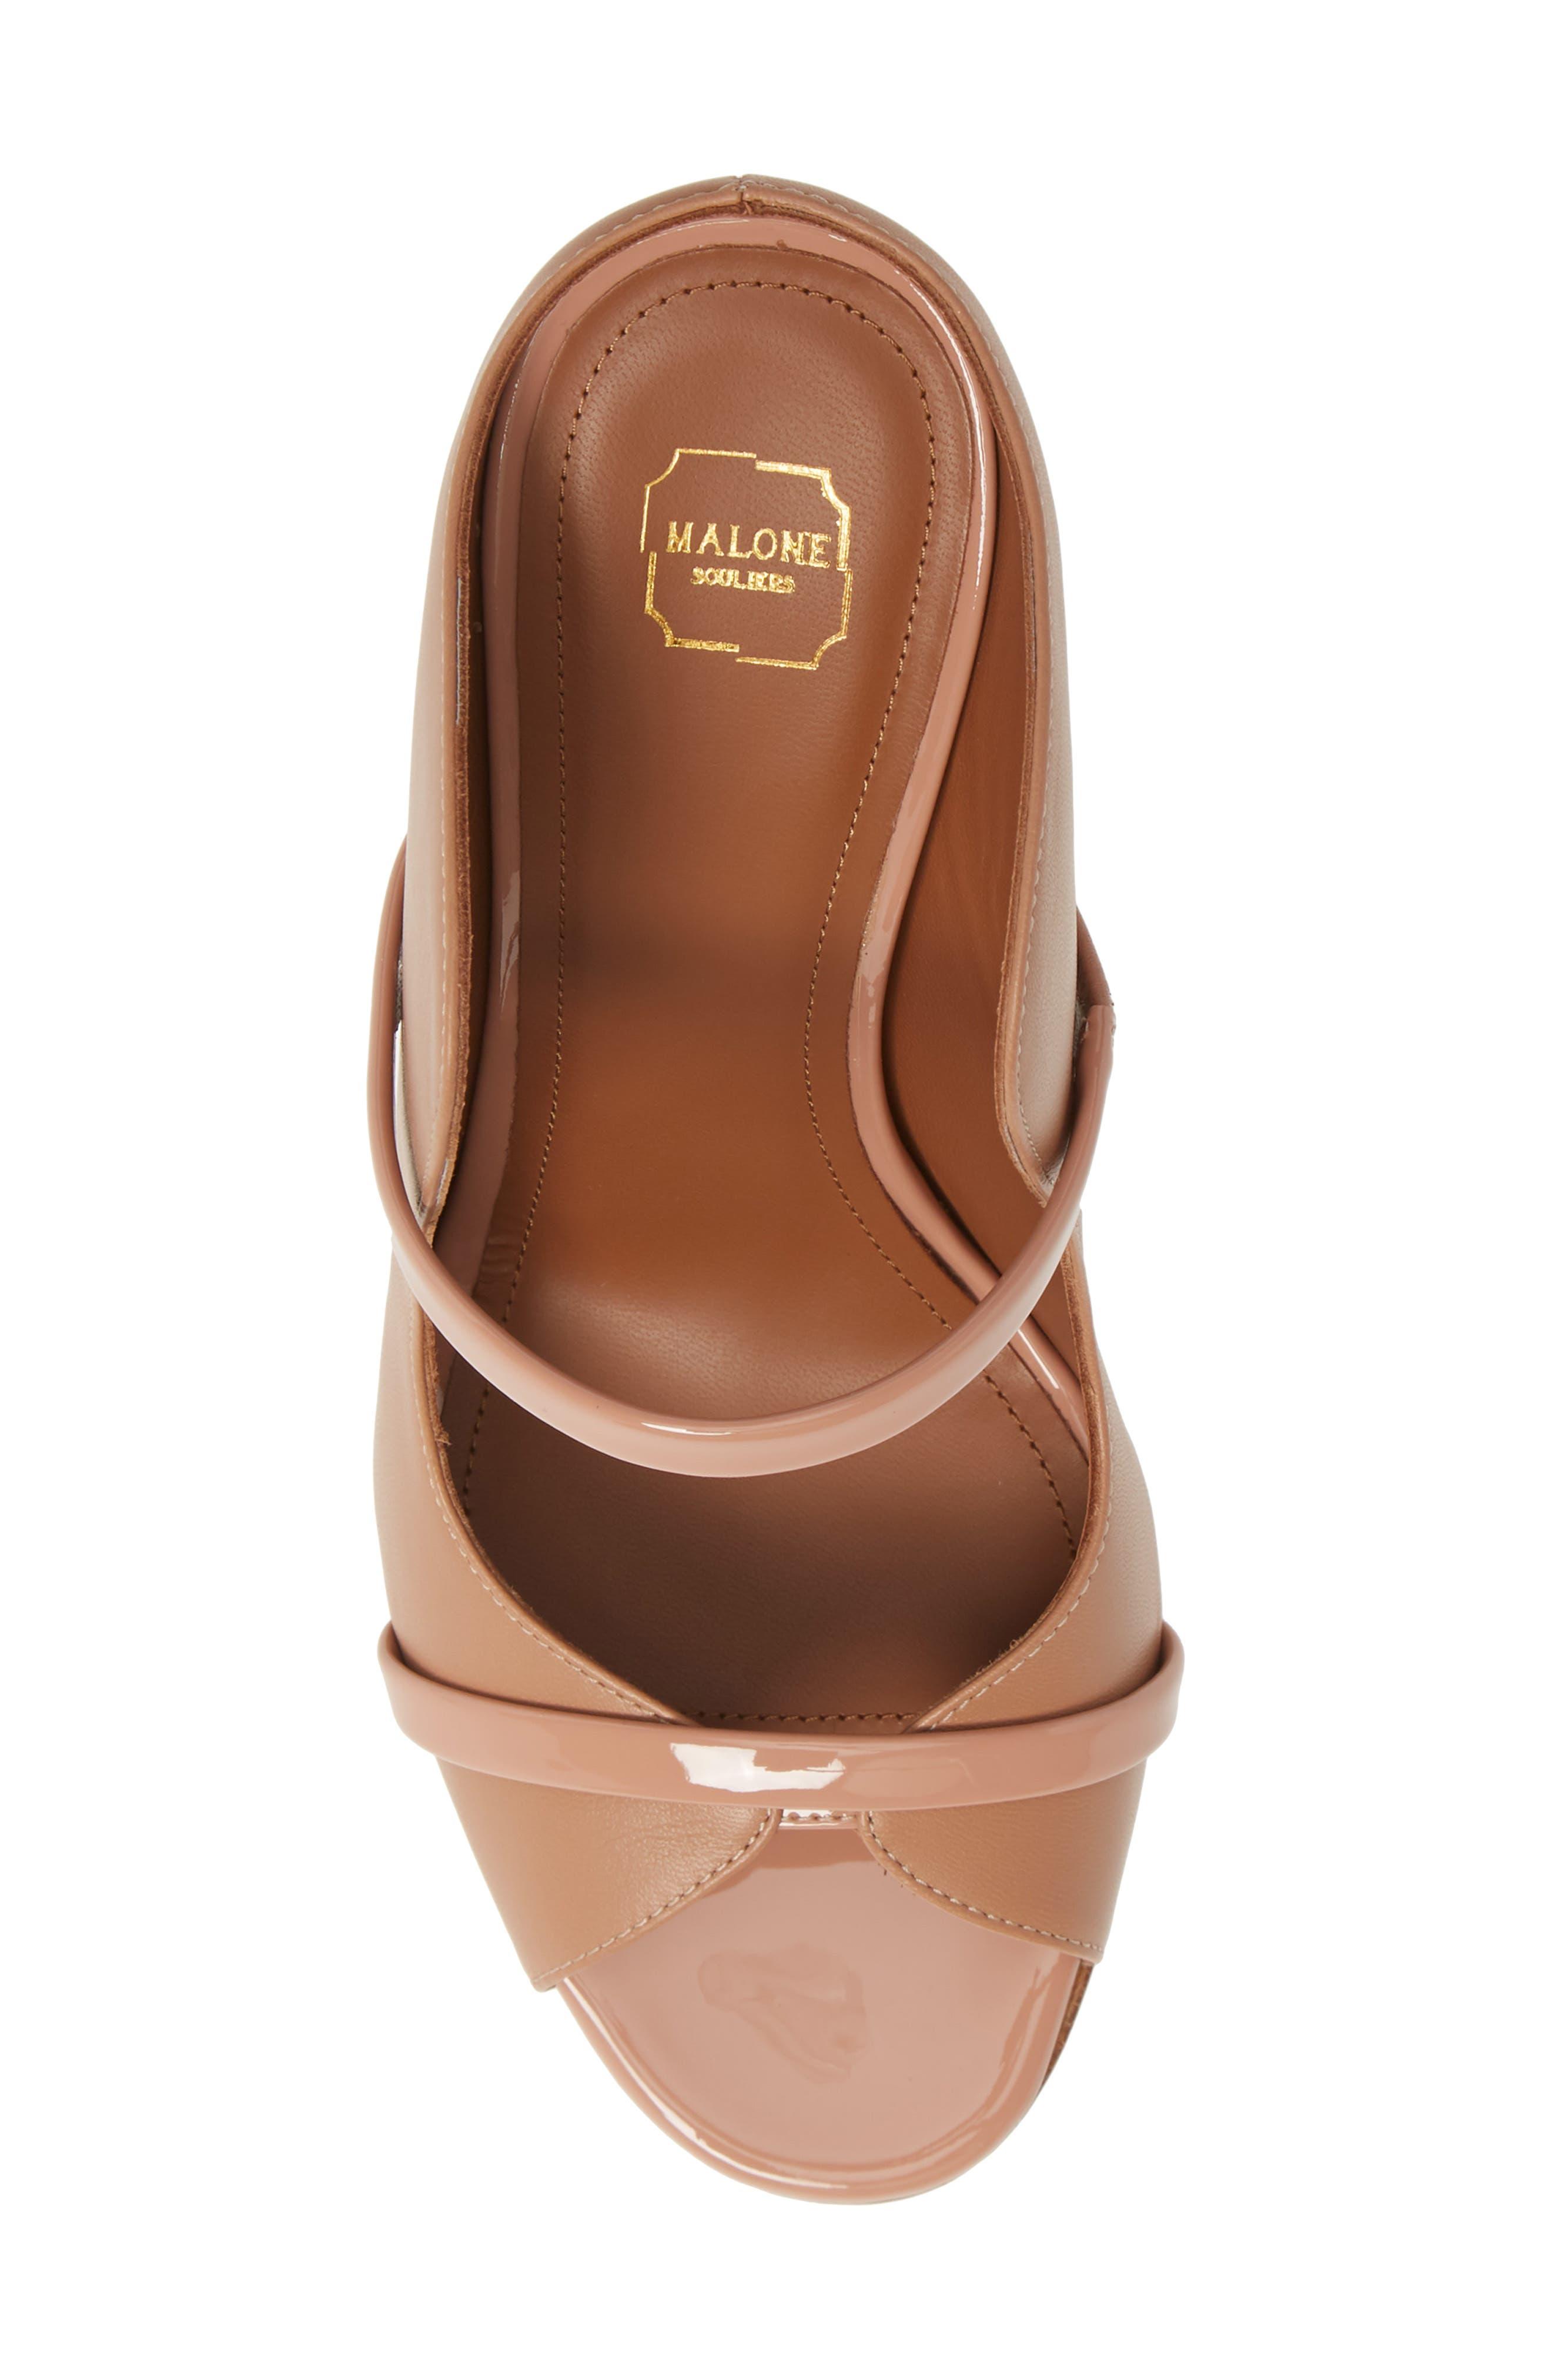 MALONE SOULIERS,                             Norah Block Heel Sandal,                             Alternate thumbnail 5, color,                             NUDE/ BLUSH